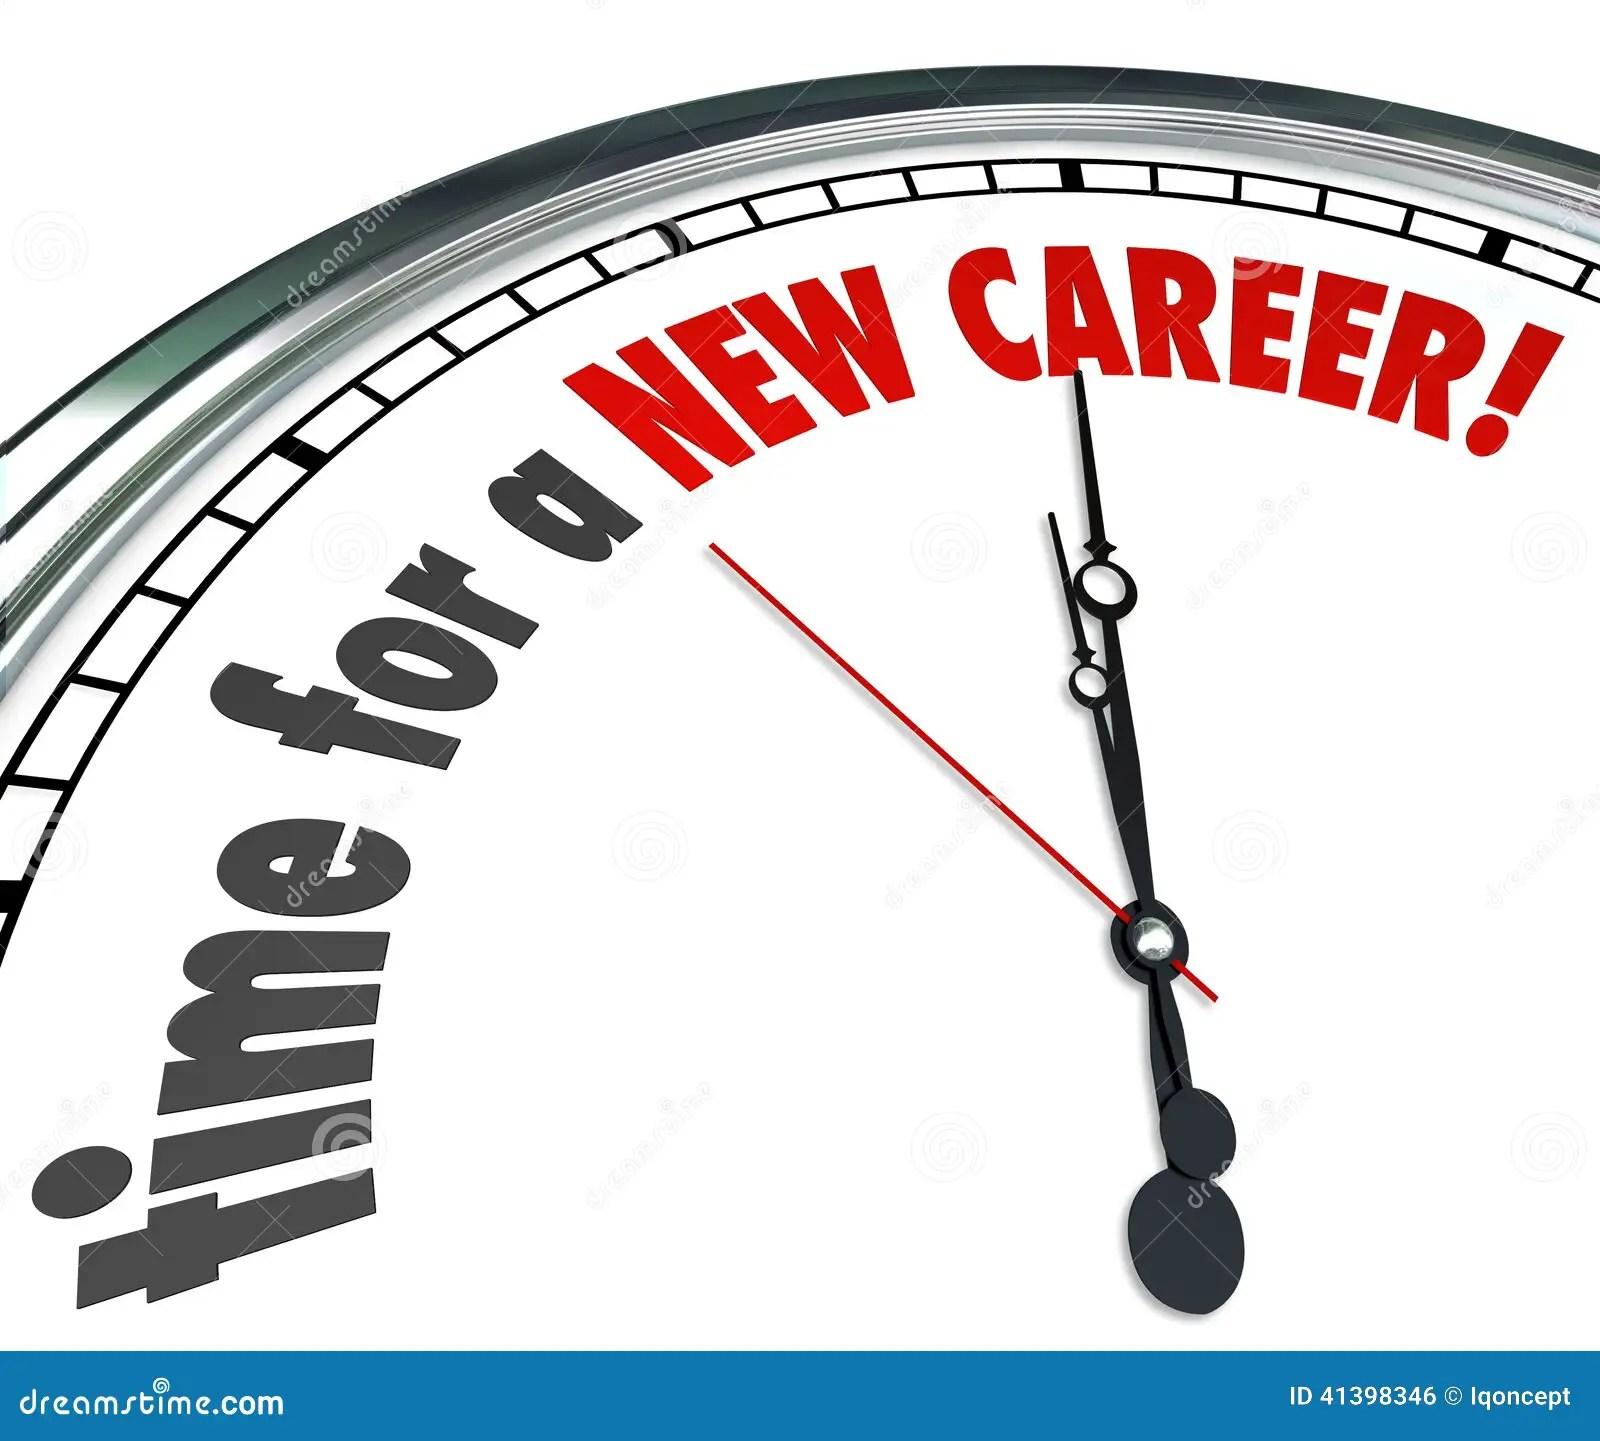 i want a career change livmoore tk i want a career change 25 04 2017